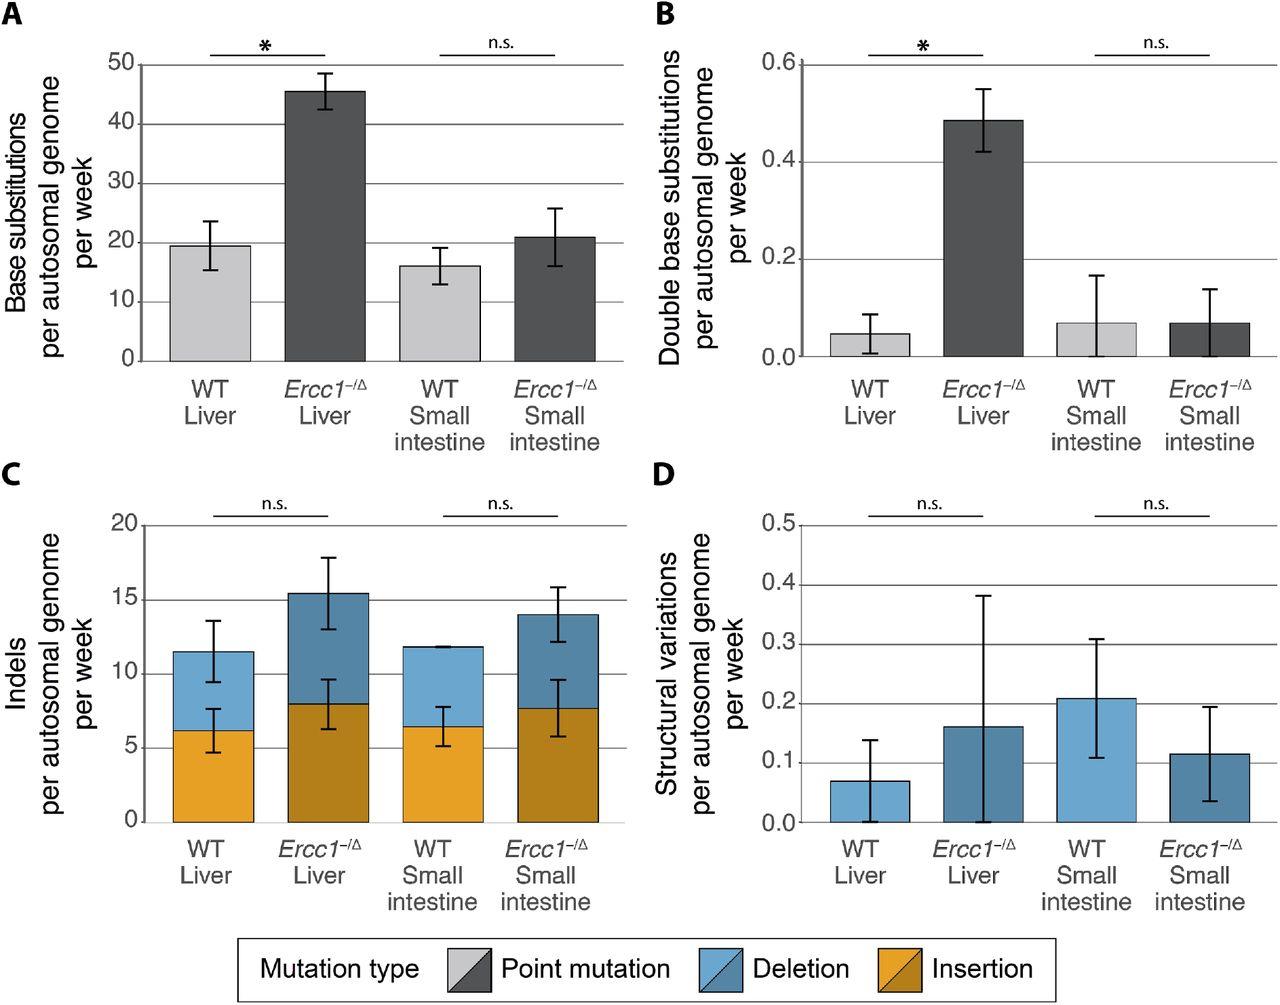 Deficiency of nucleotide excision repair explains mutational